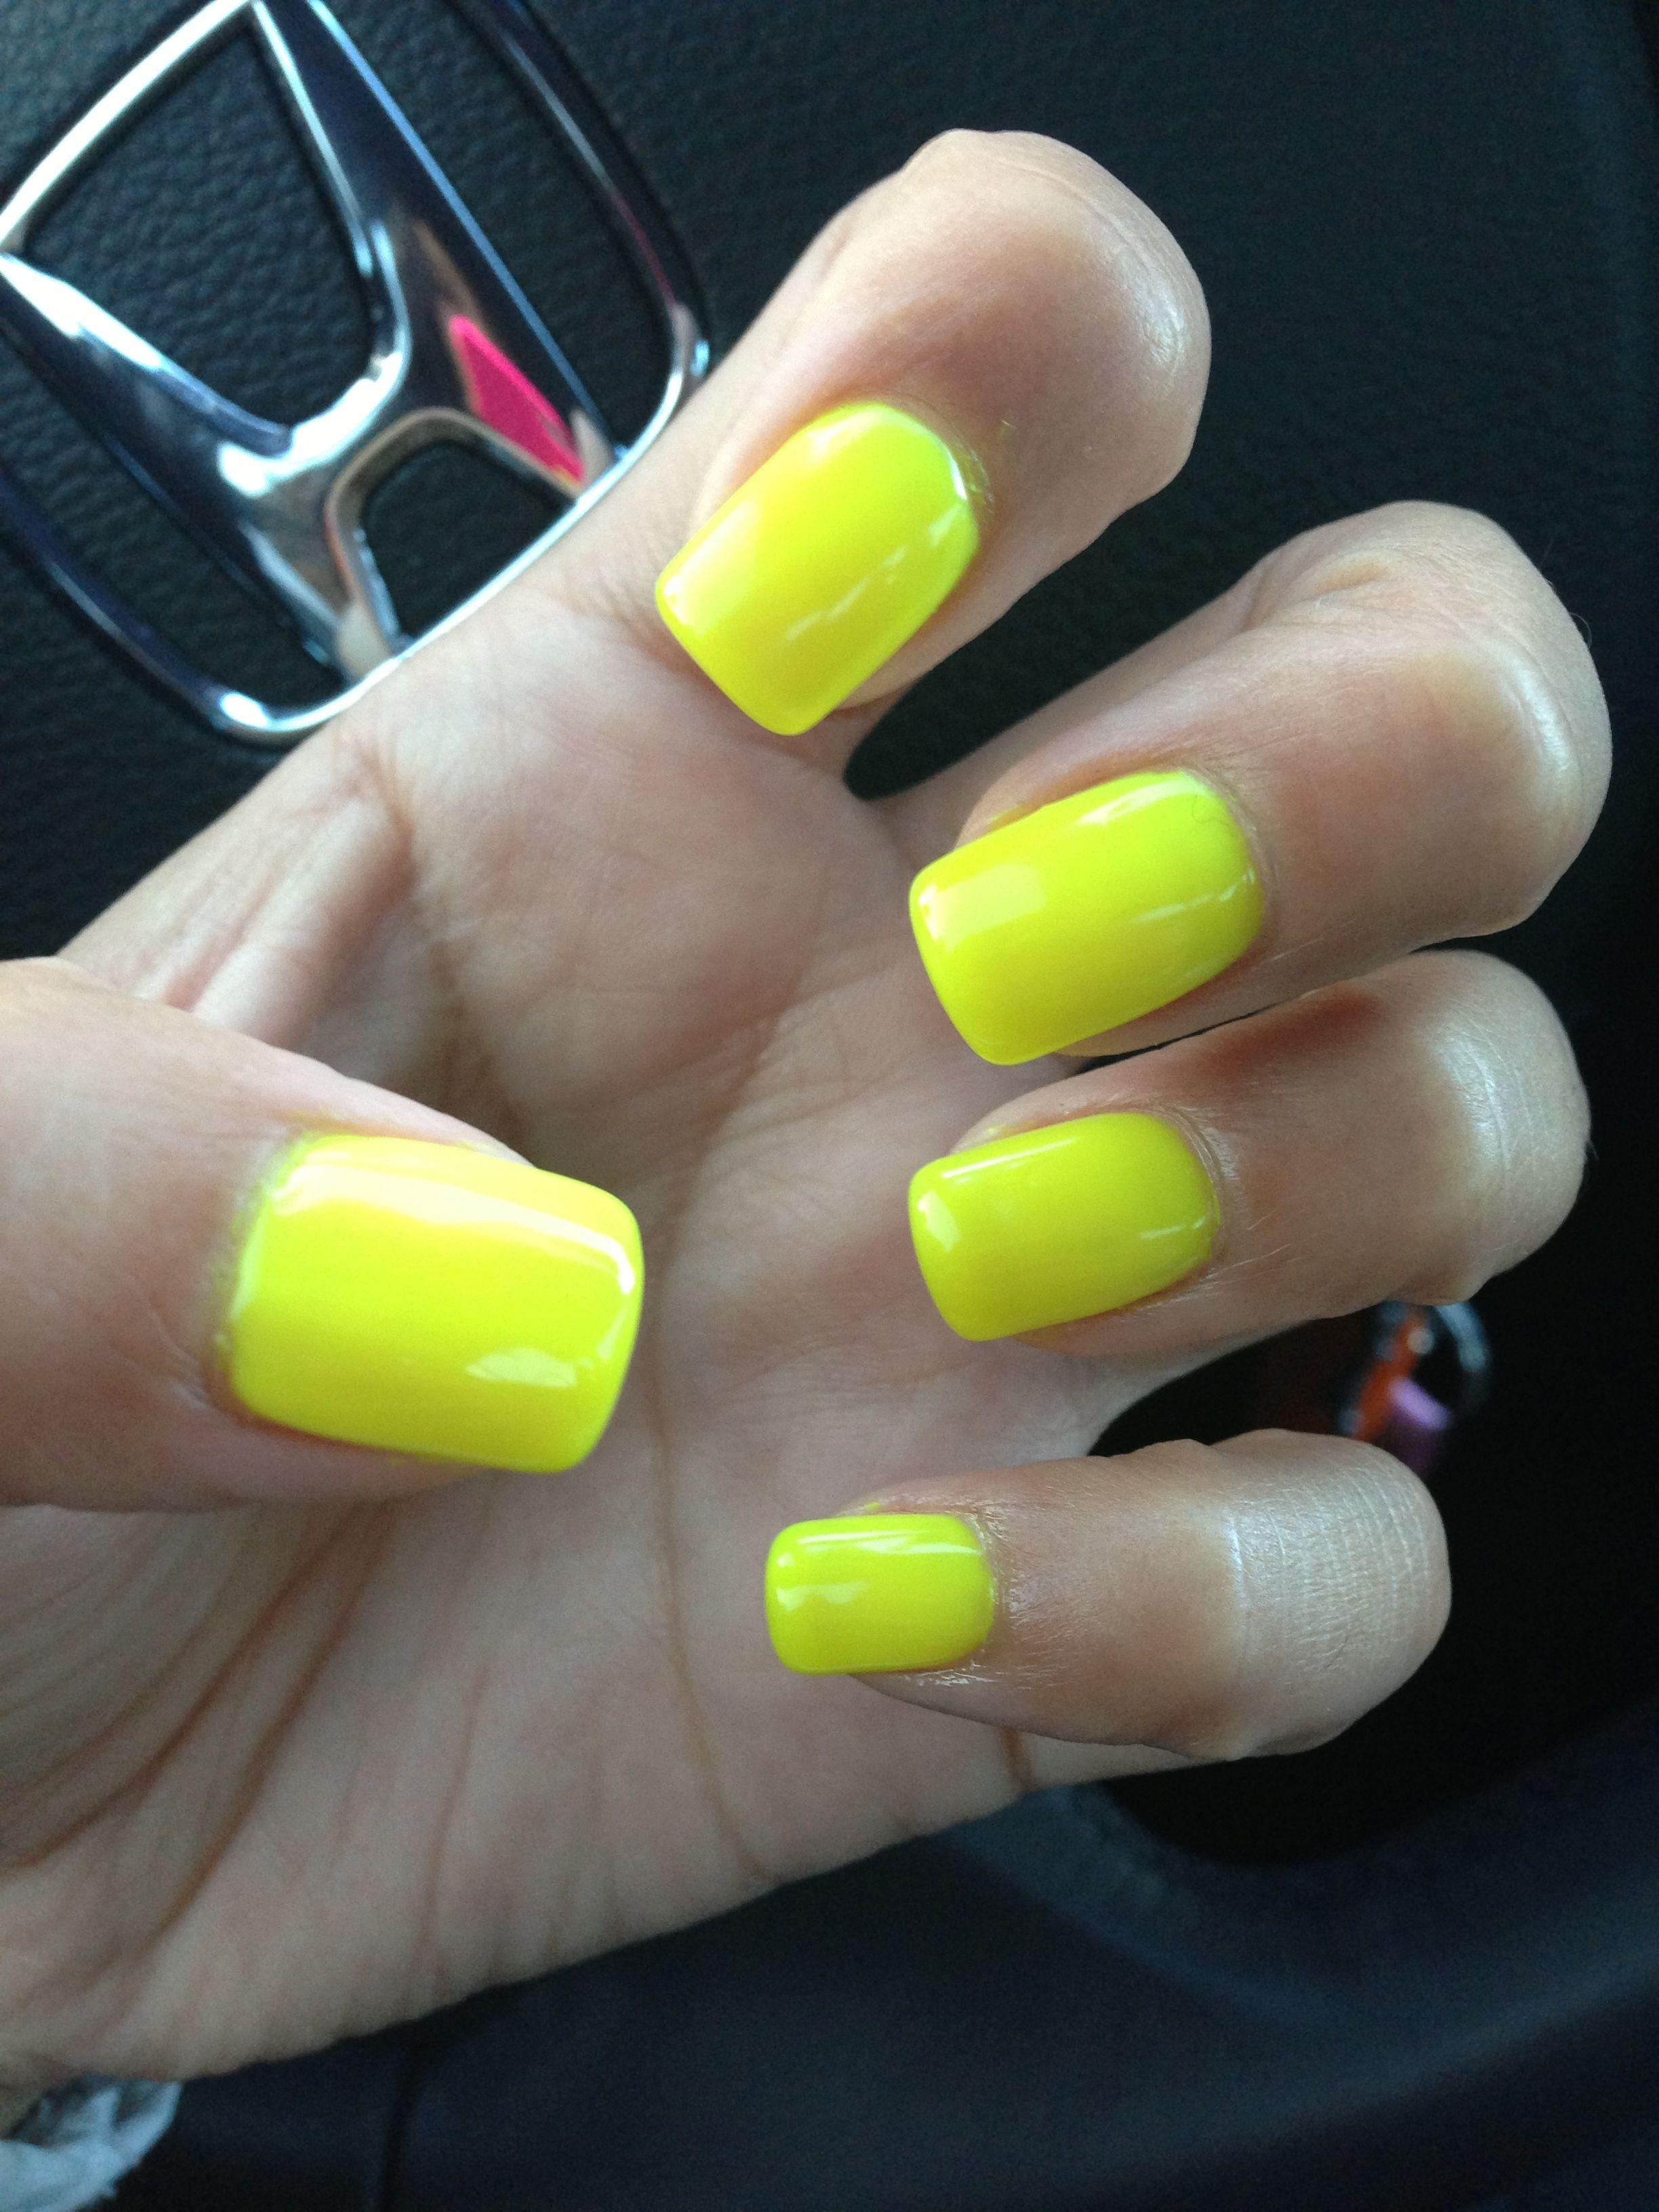 Neon yellow nails | Nails | Pinterest | Neon yellow nails and Yellow ...